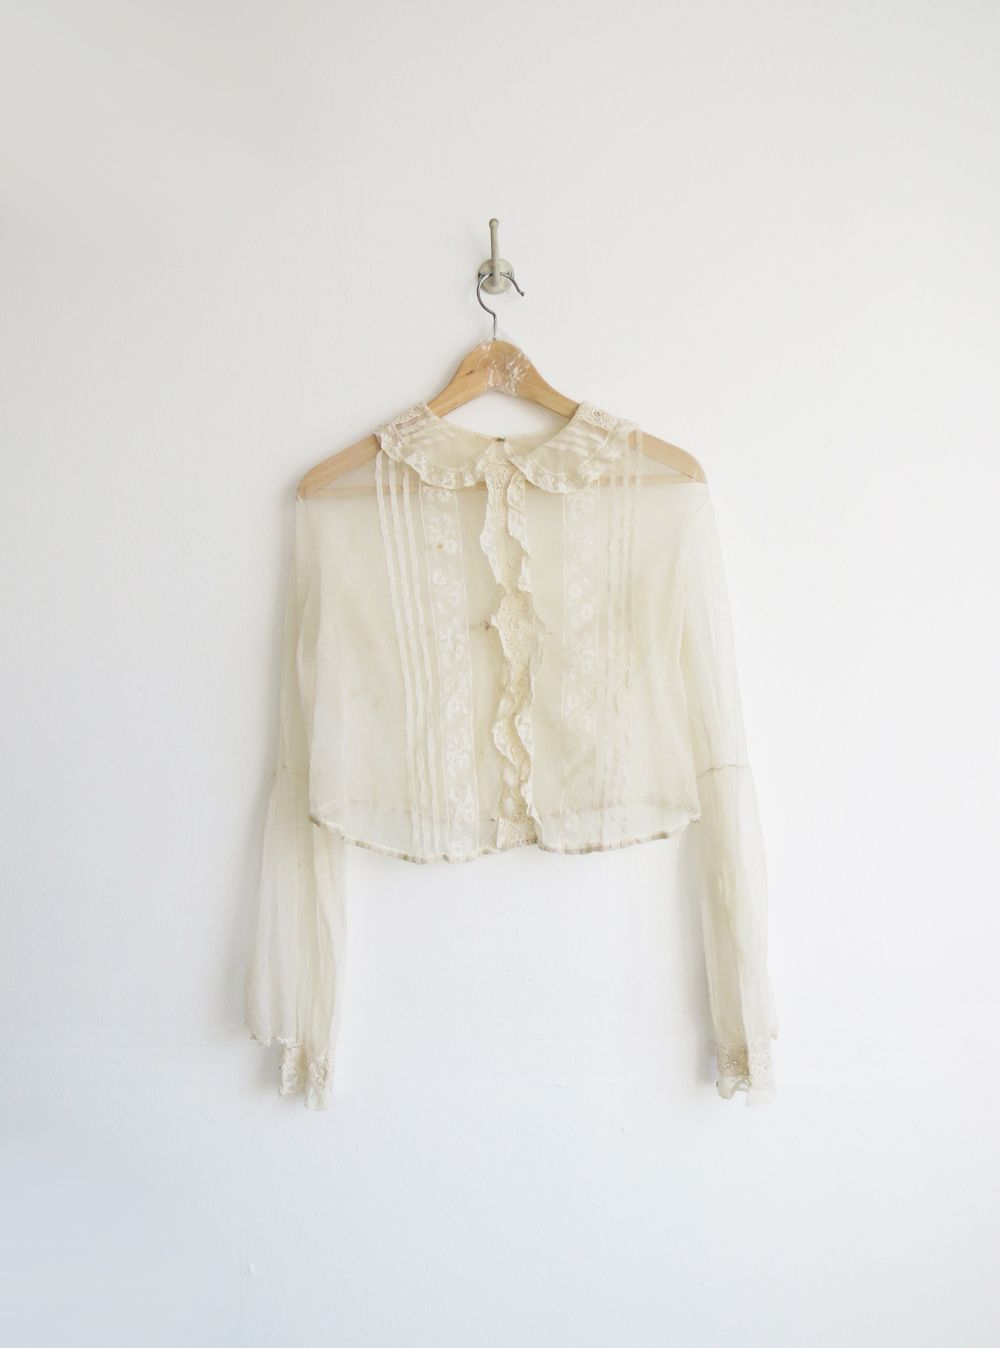 Antique sheer blouse vintage us top style lovett